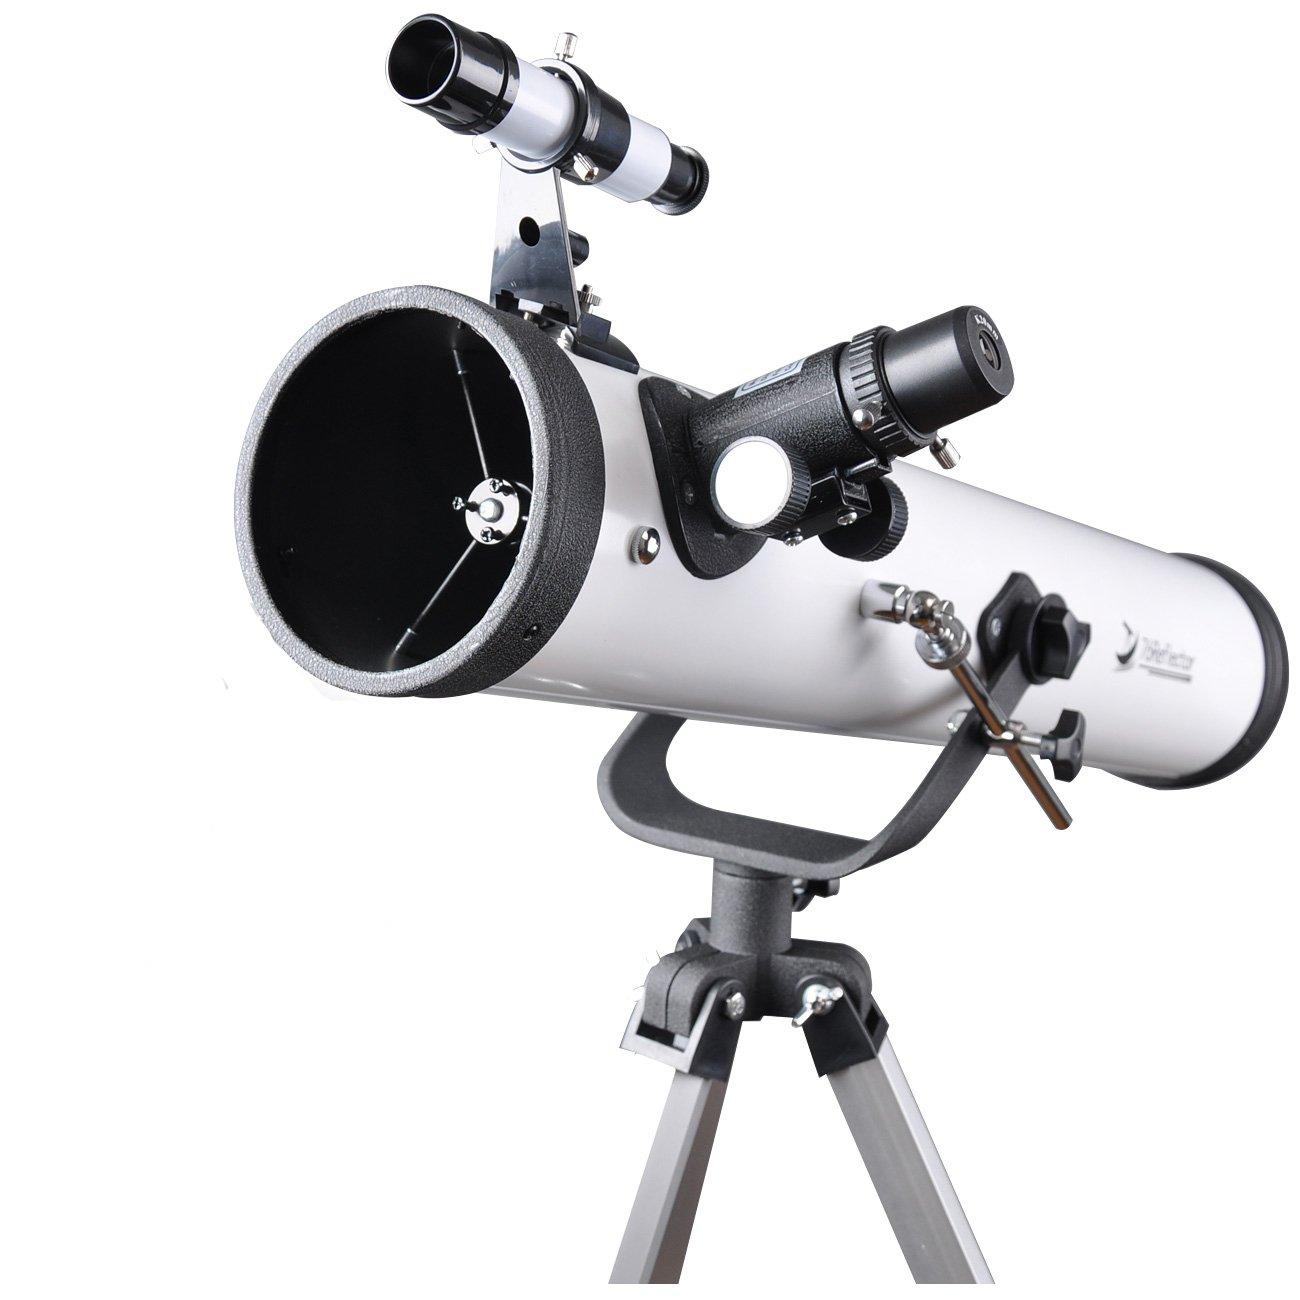 76AZ 望遠鏡 月観察 反射望遠鏡 三脚と1.25インチ 10mm アイピース スマートフォンアダプター 天文学の始まりに   B07M9JCXJ4